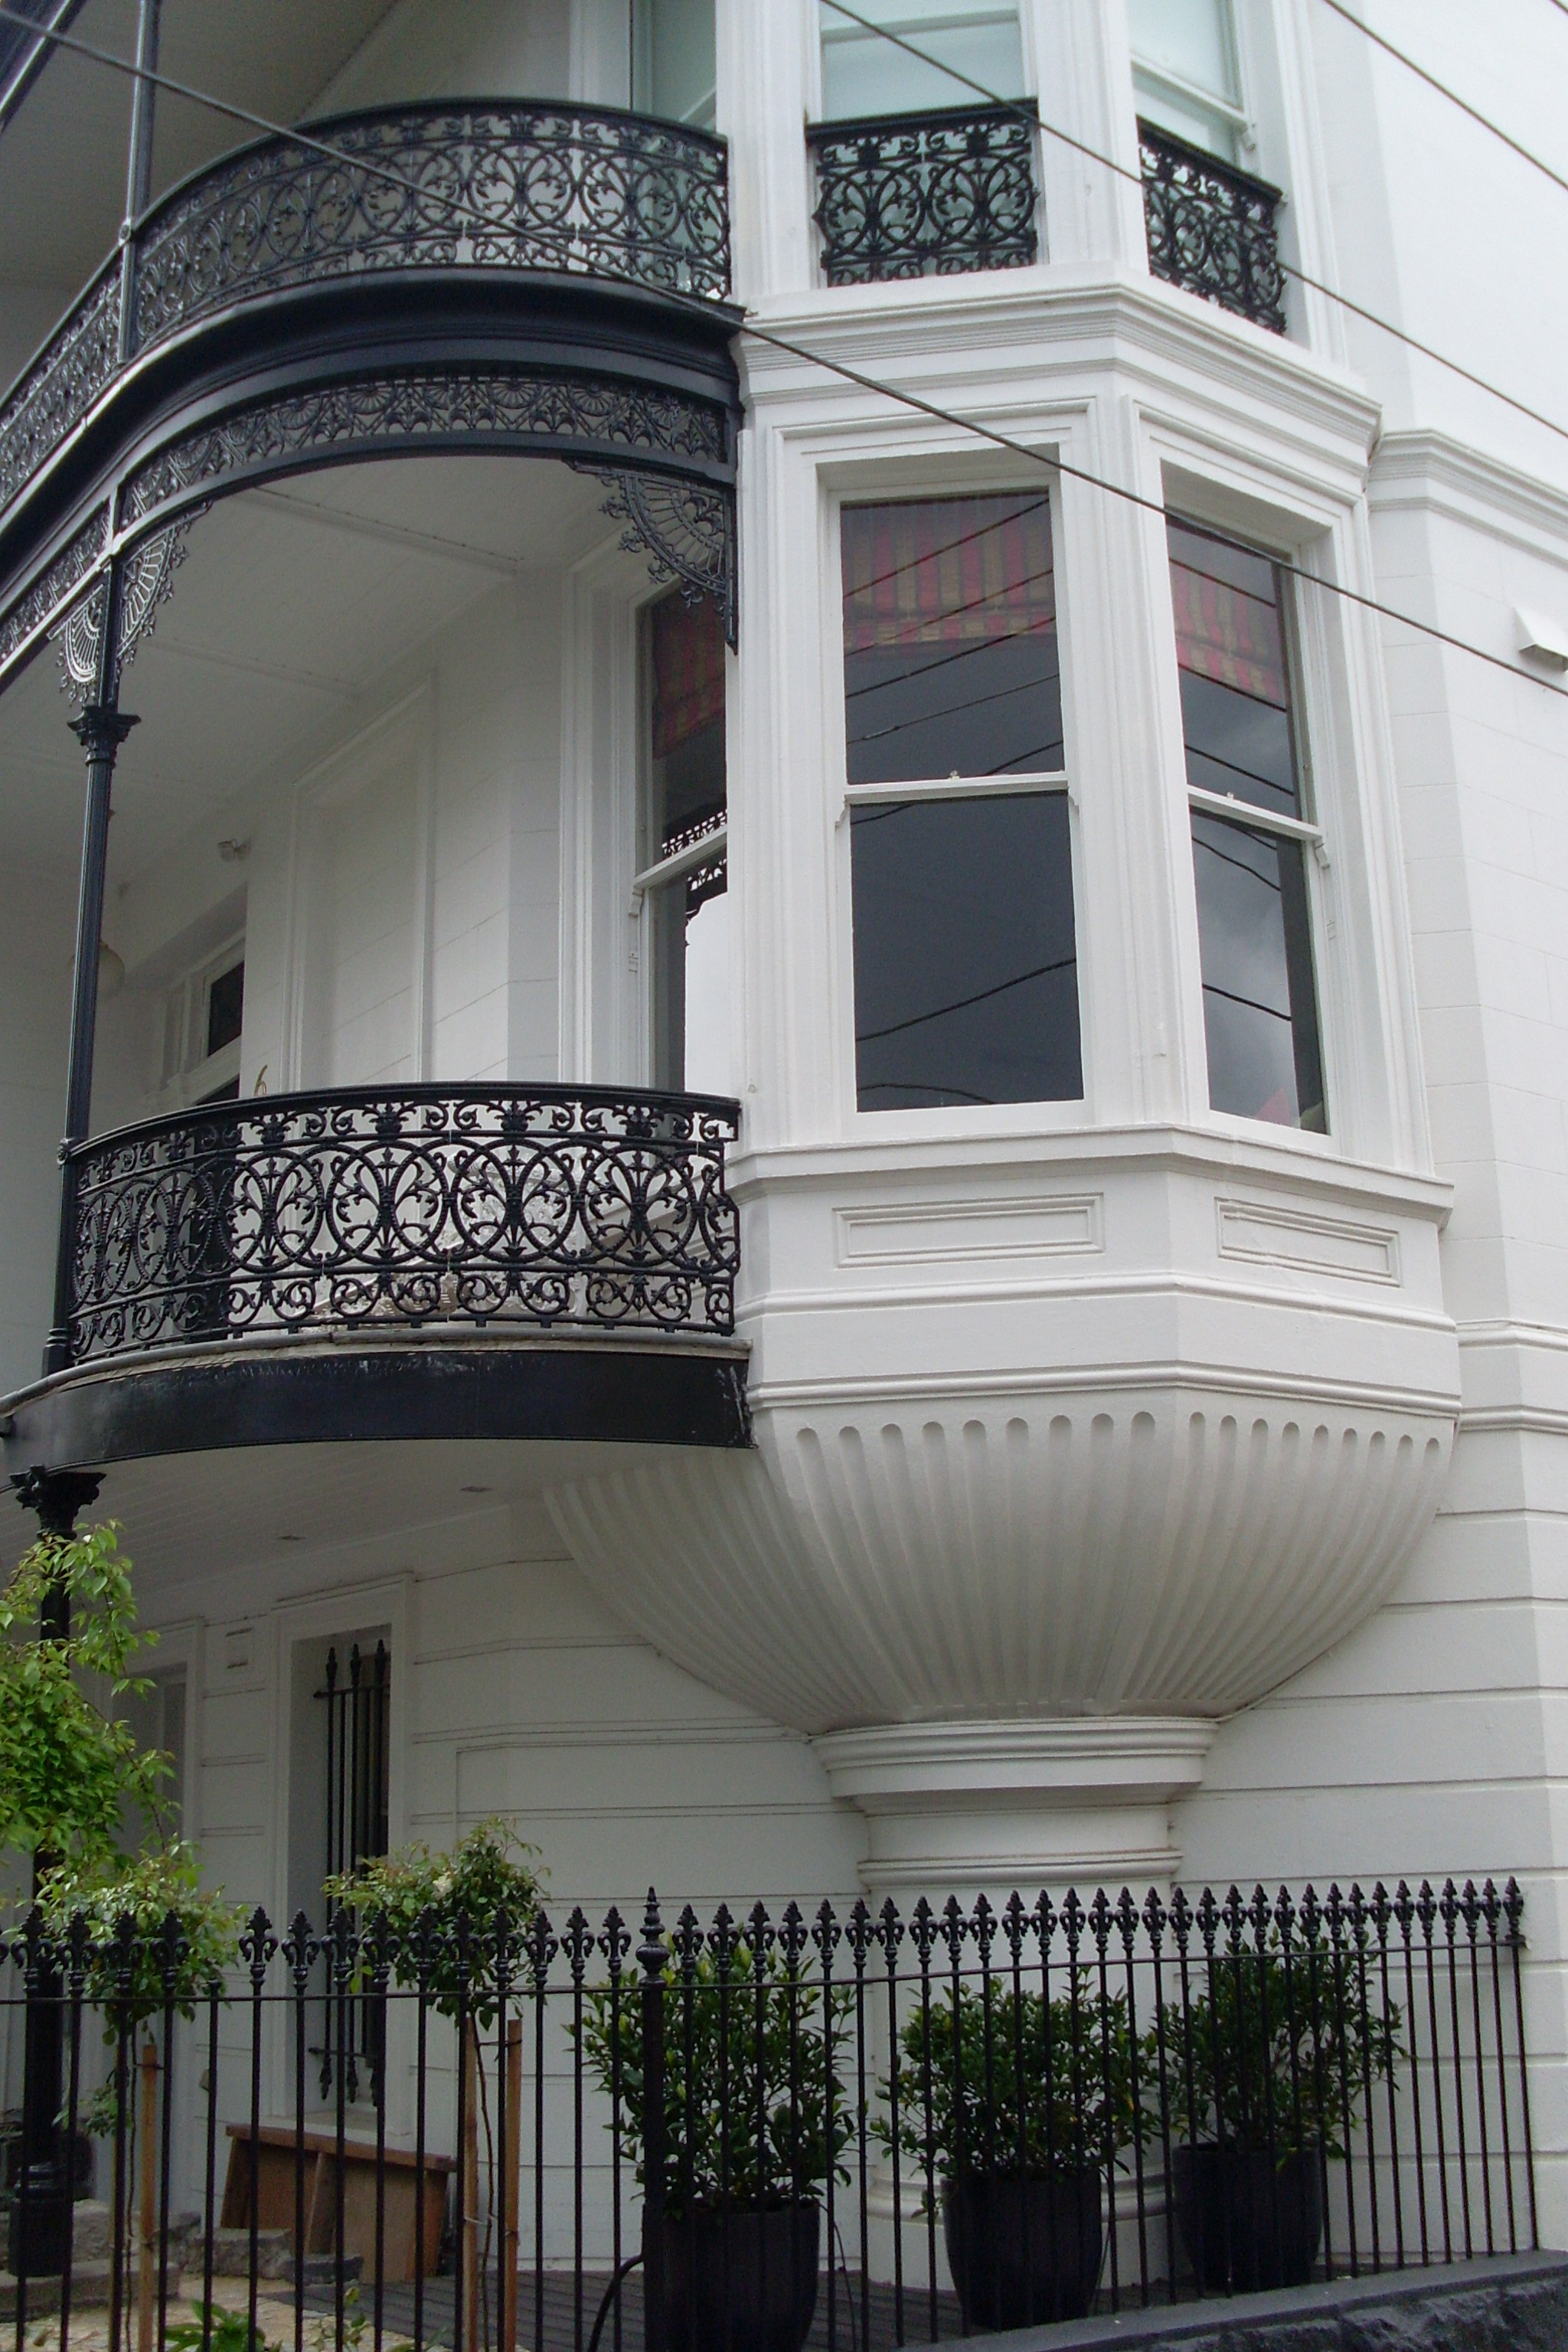 Grand, elegant architecture in Melbourne